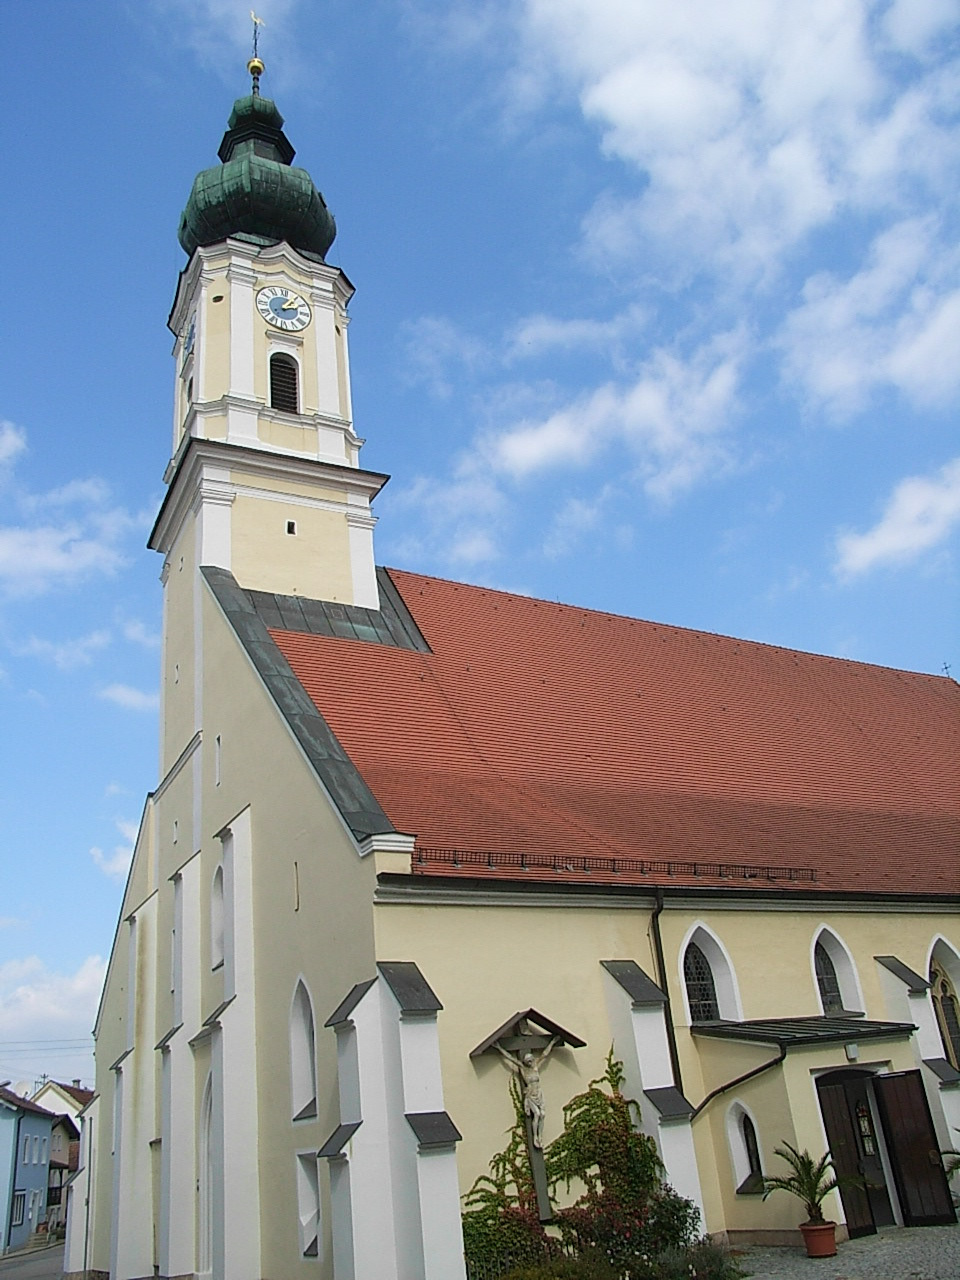 Pfarrkirche Rotthalmc3Bcnster